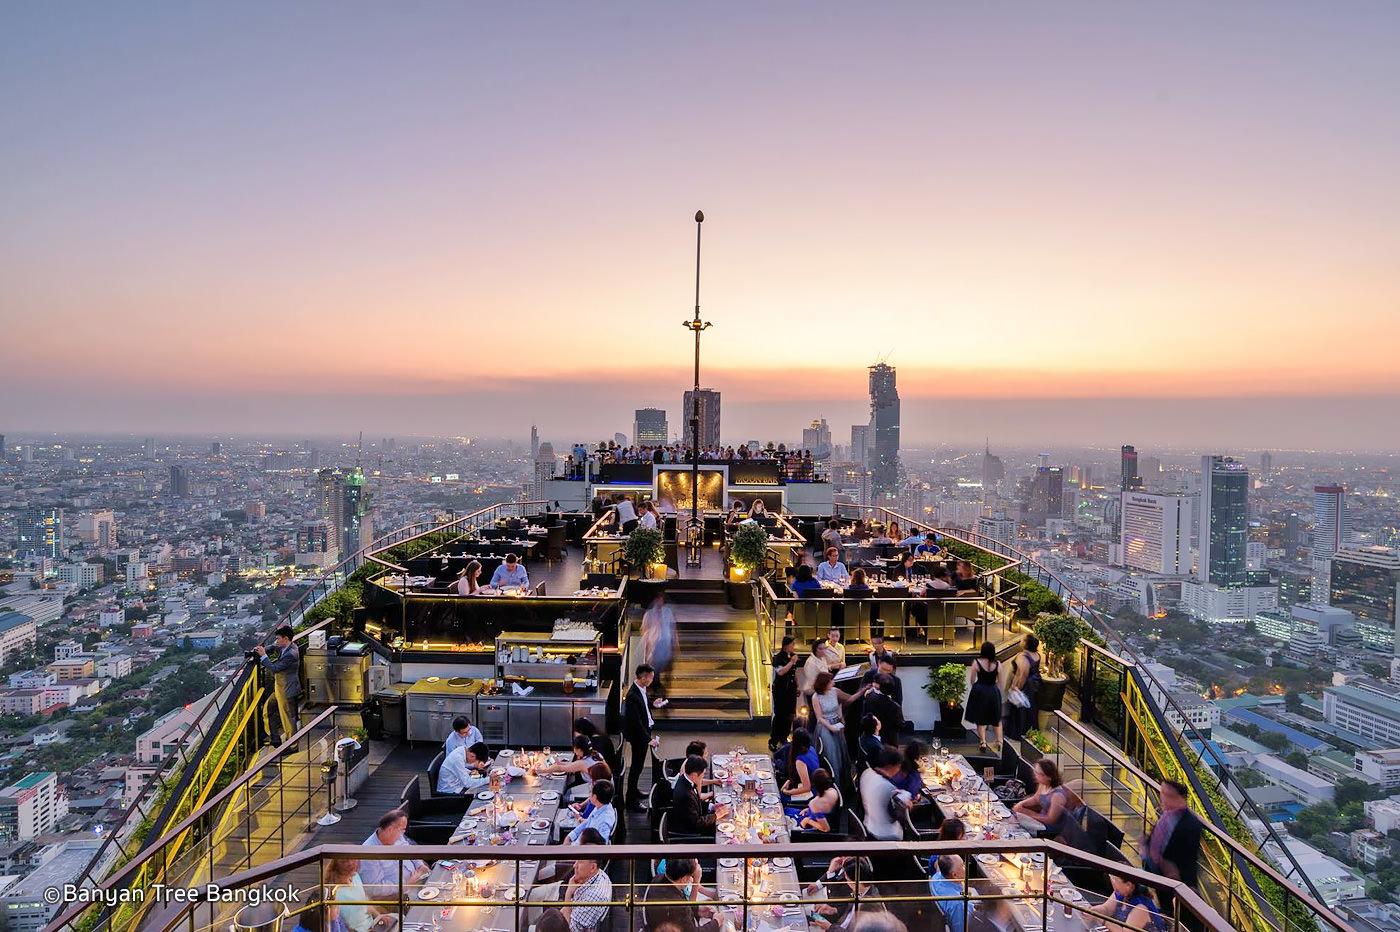 Vertigo Rooftop Bar at Banyan Tree Hotel